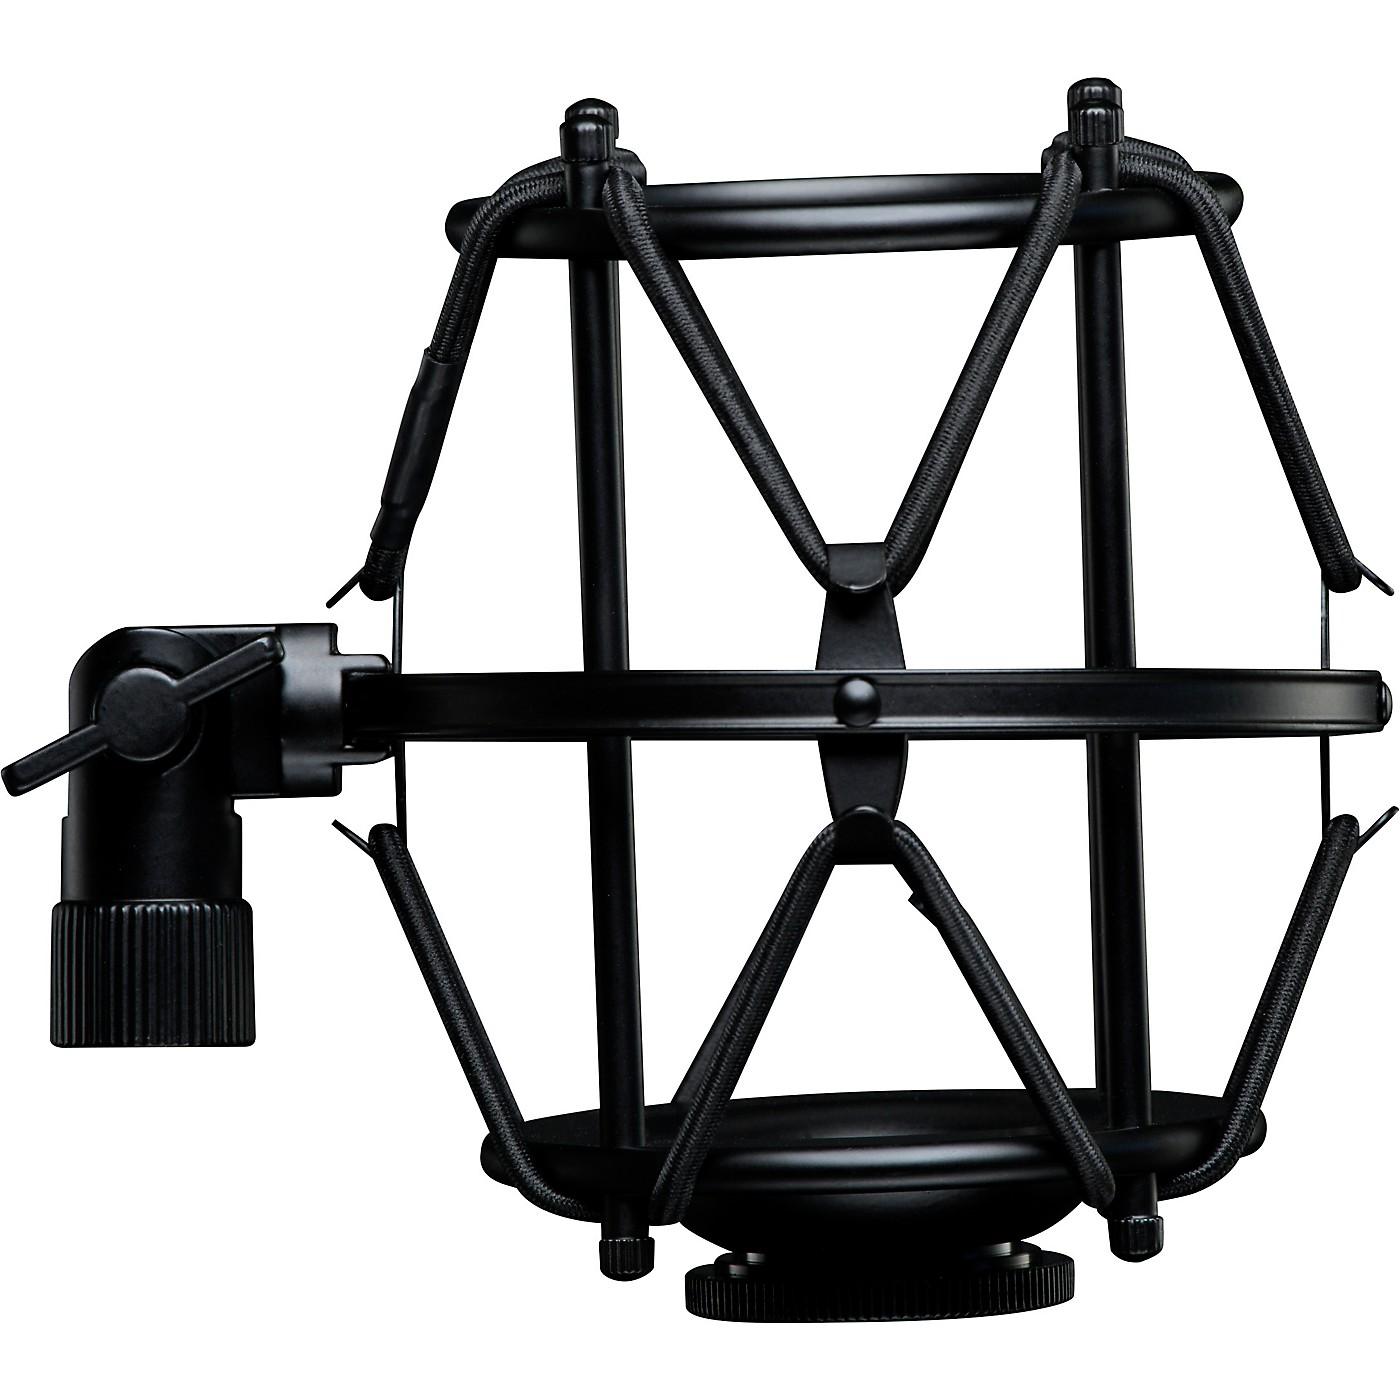 Presonus Universal Shock Mount for PX-1 & M7 Condenser Microphones thumbnail